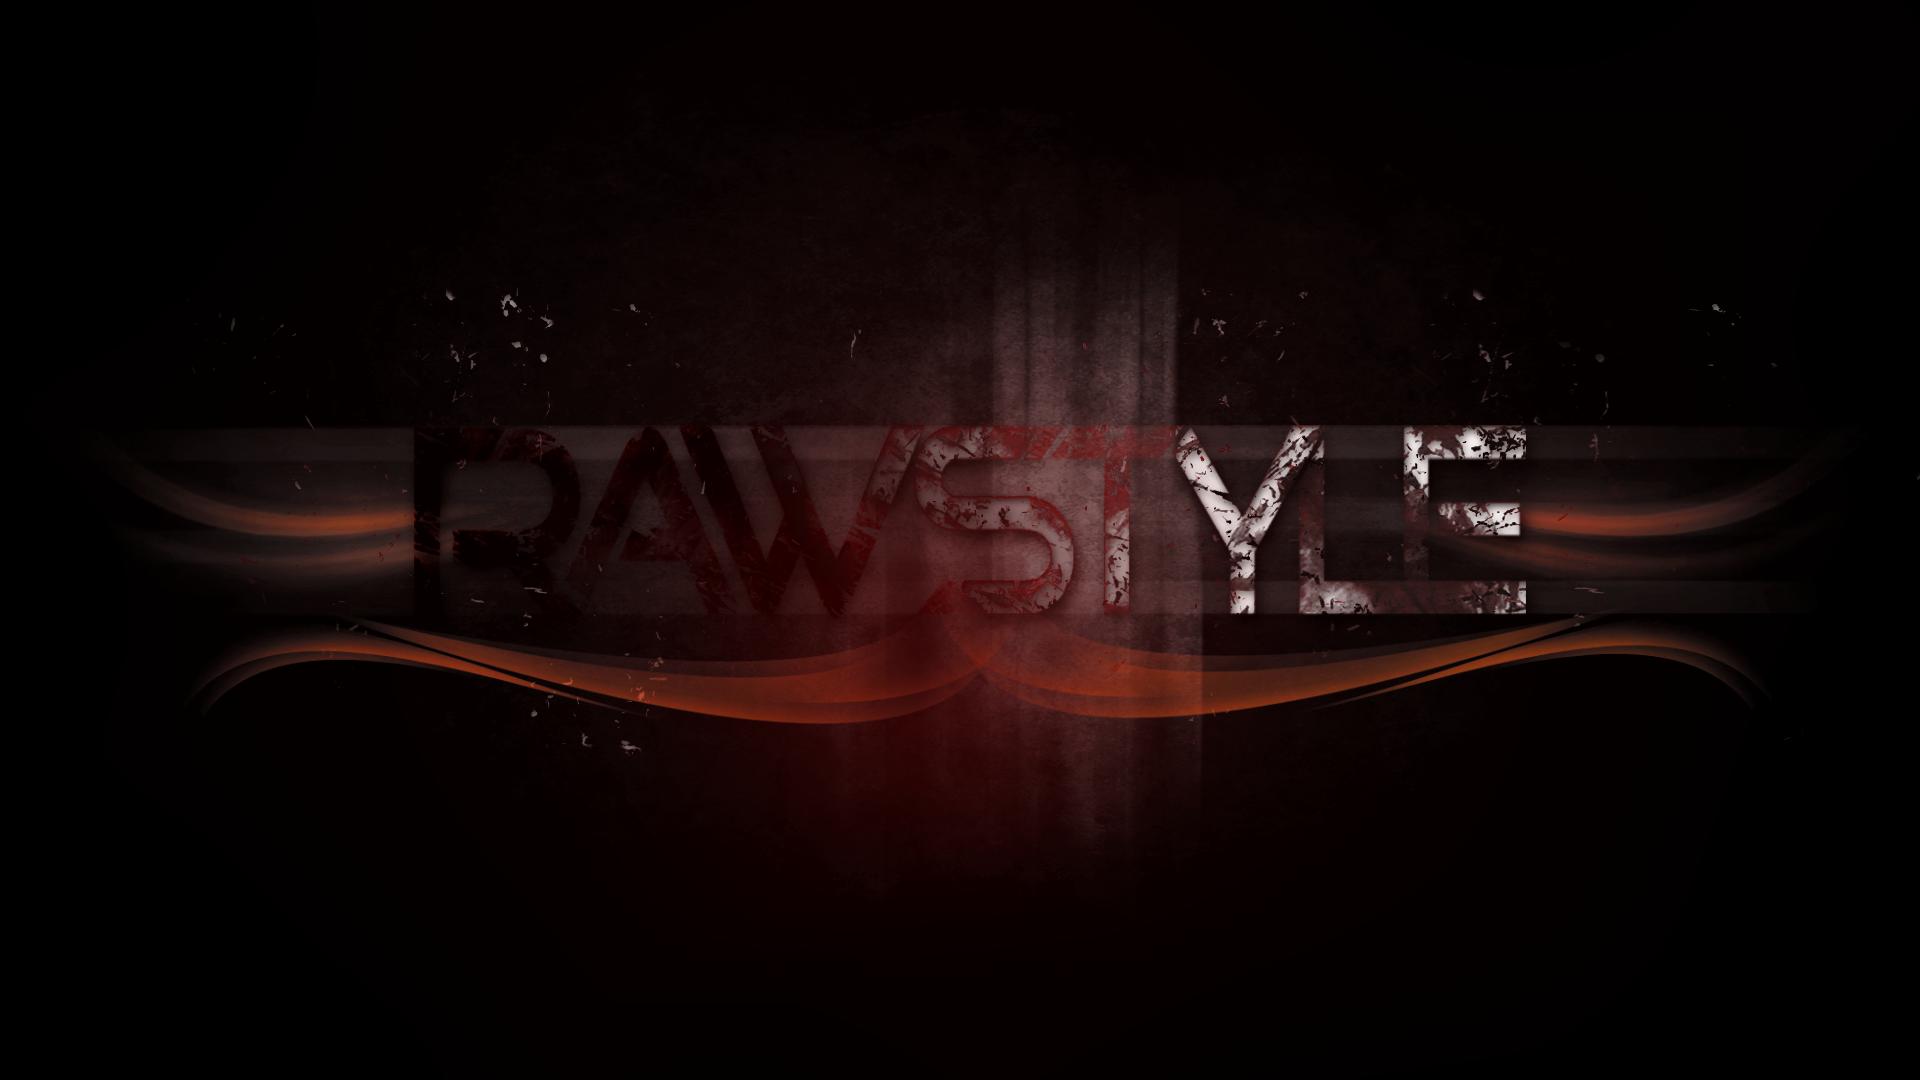 Rawstyle (Wallpaper) by Hardii